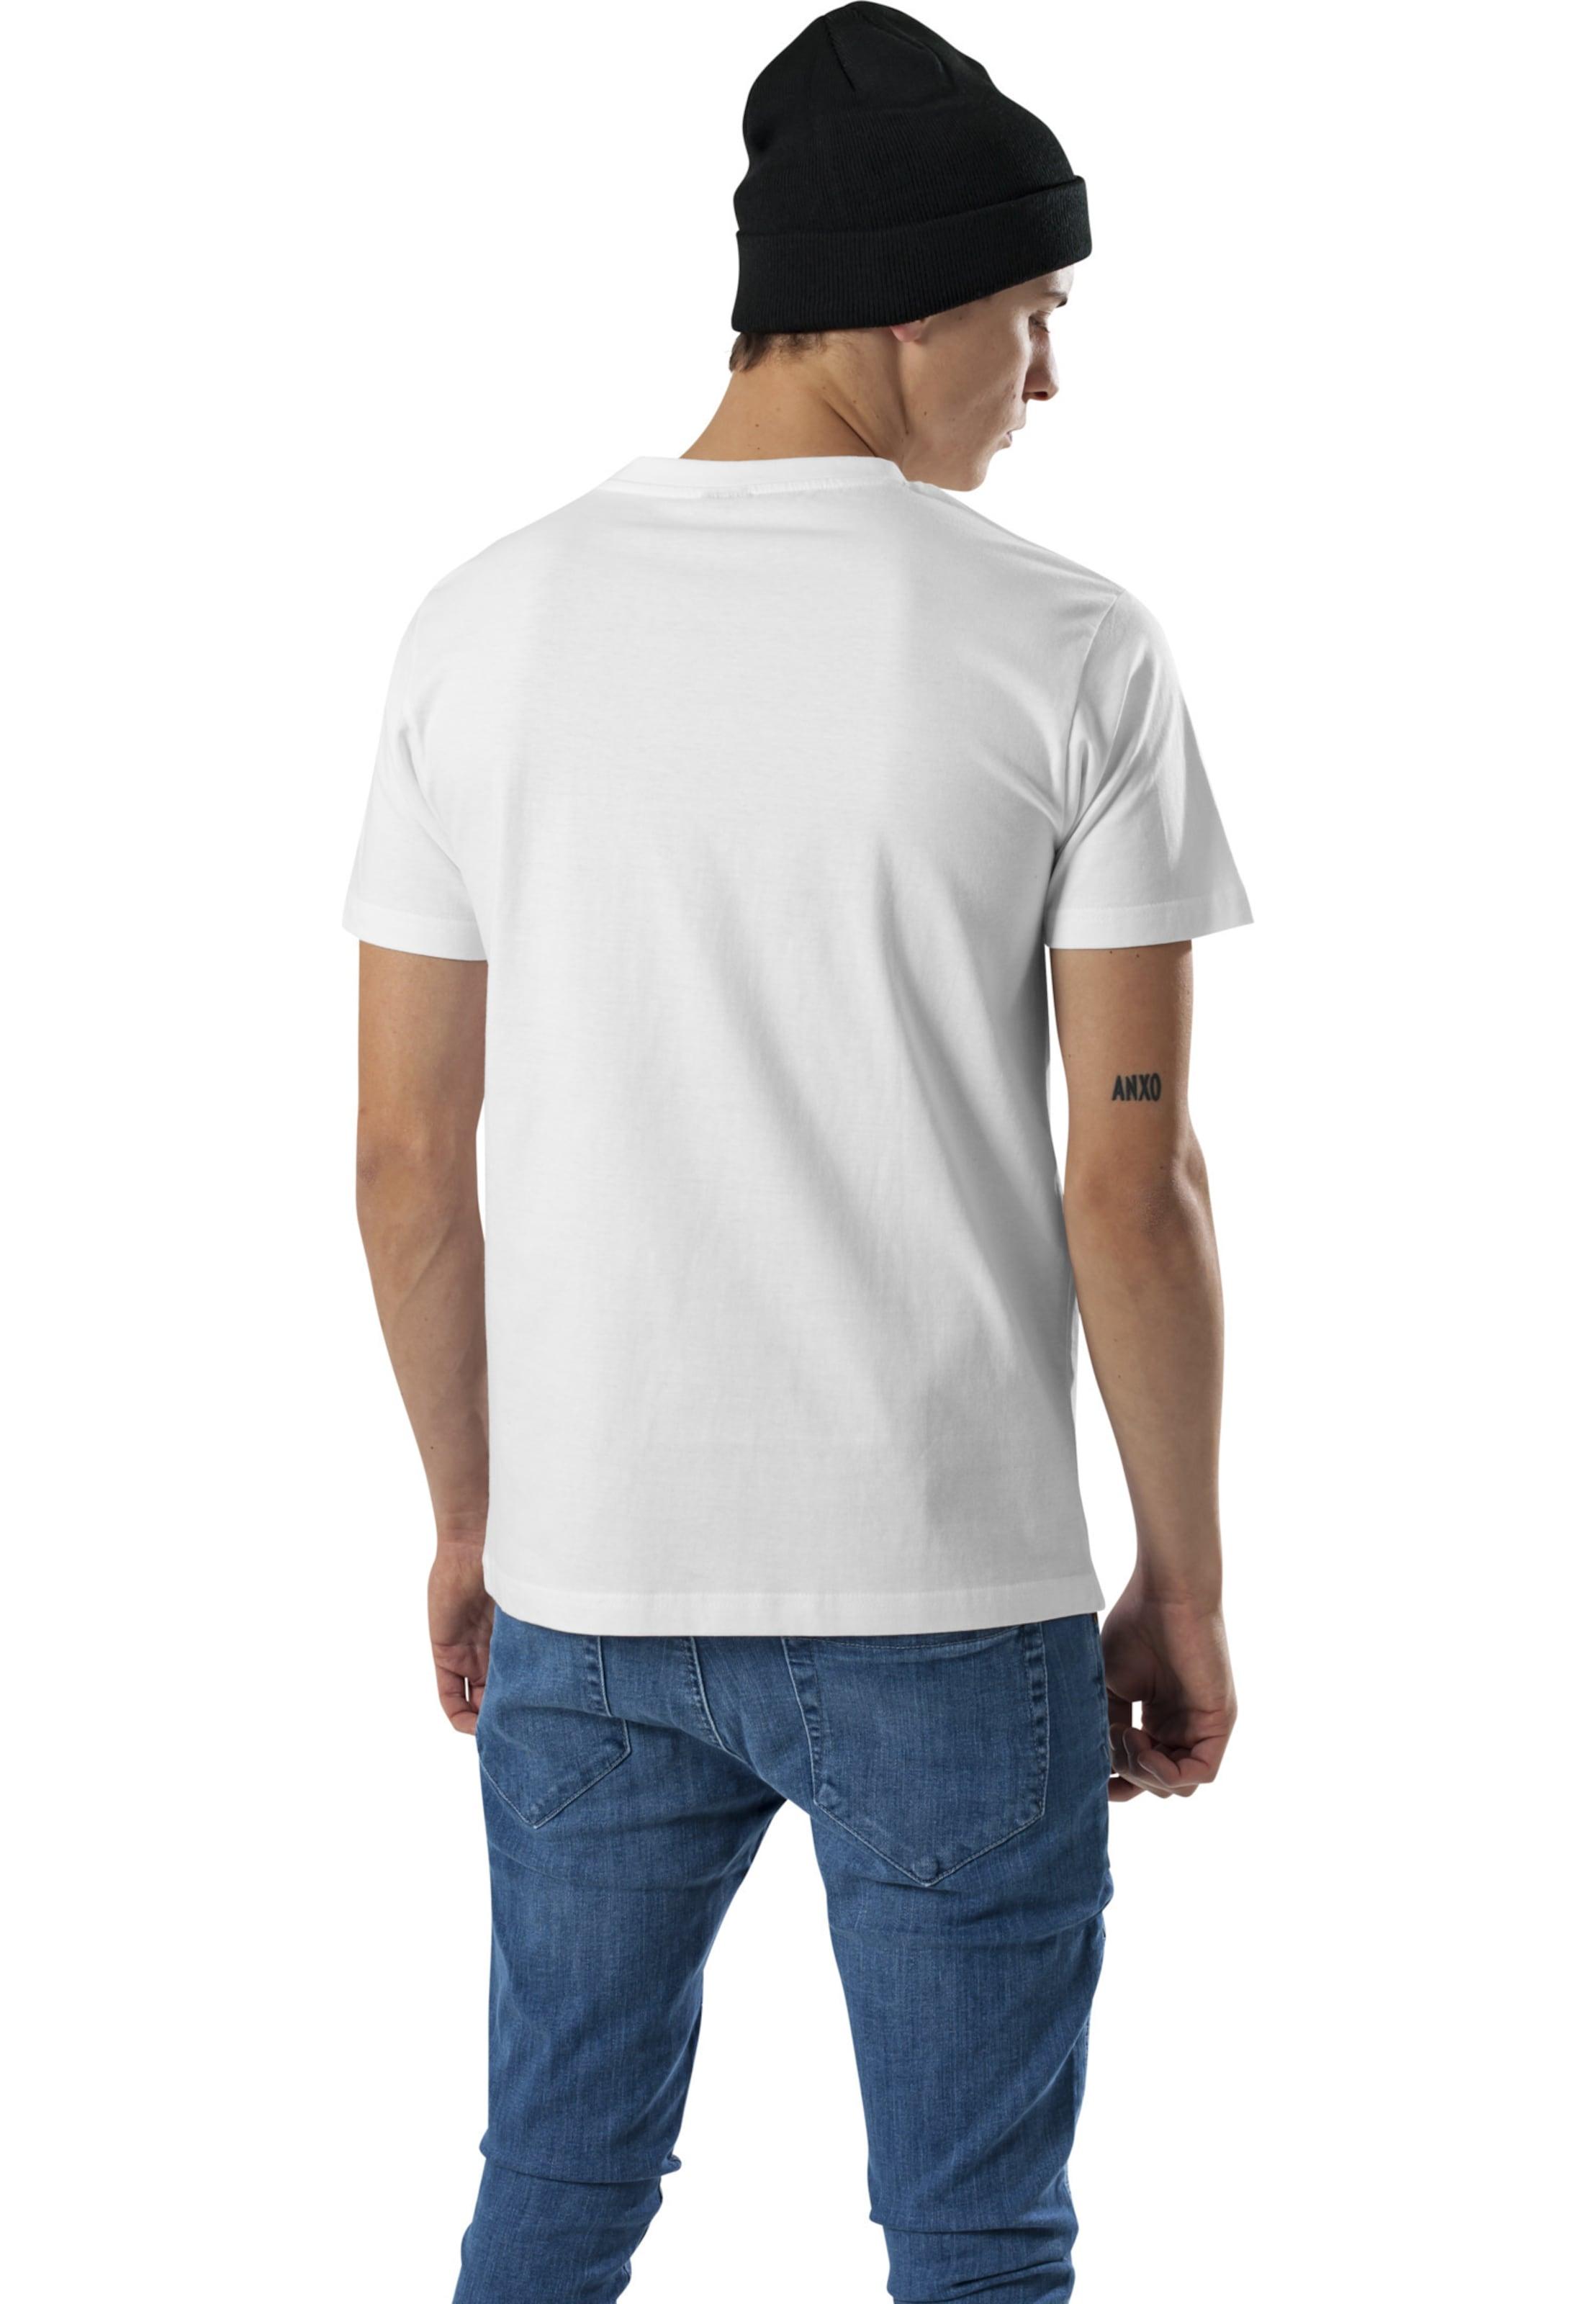 Tee 'easy Box' Shirt RotWeiß In Mister wO80XknPN